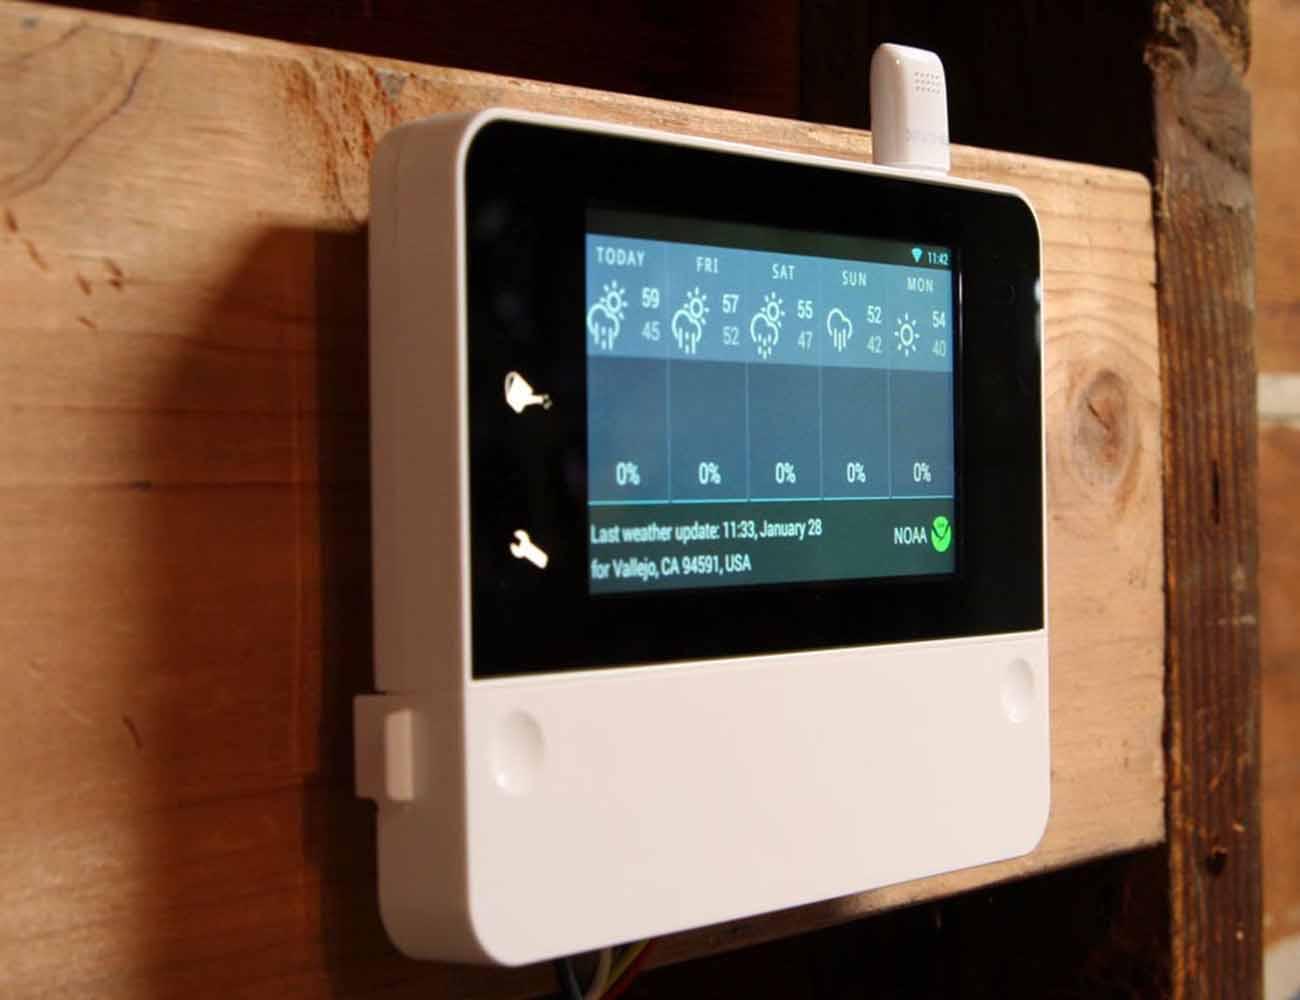 RainMachine – Smart WiFi Irrigation Controller